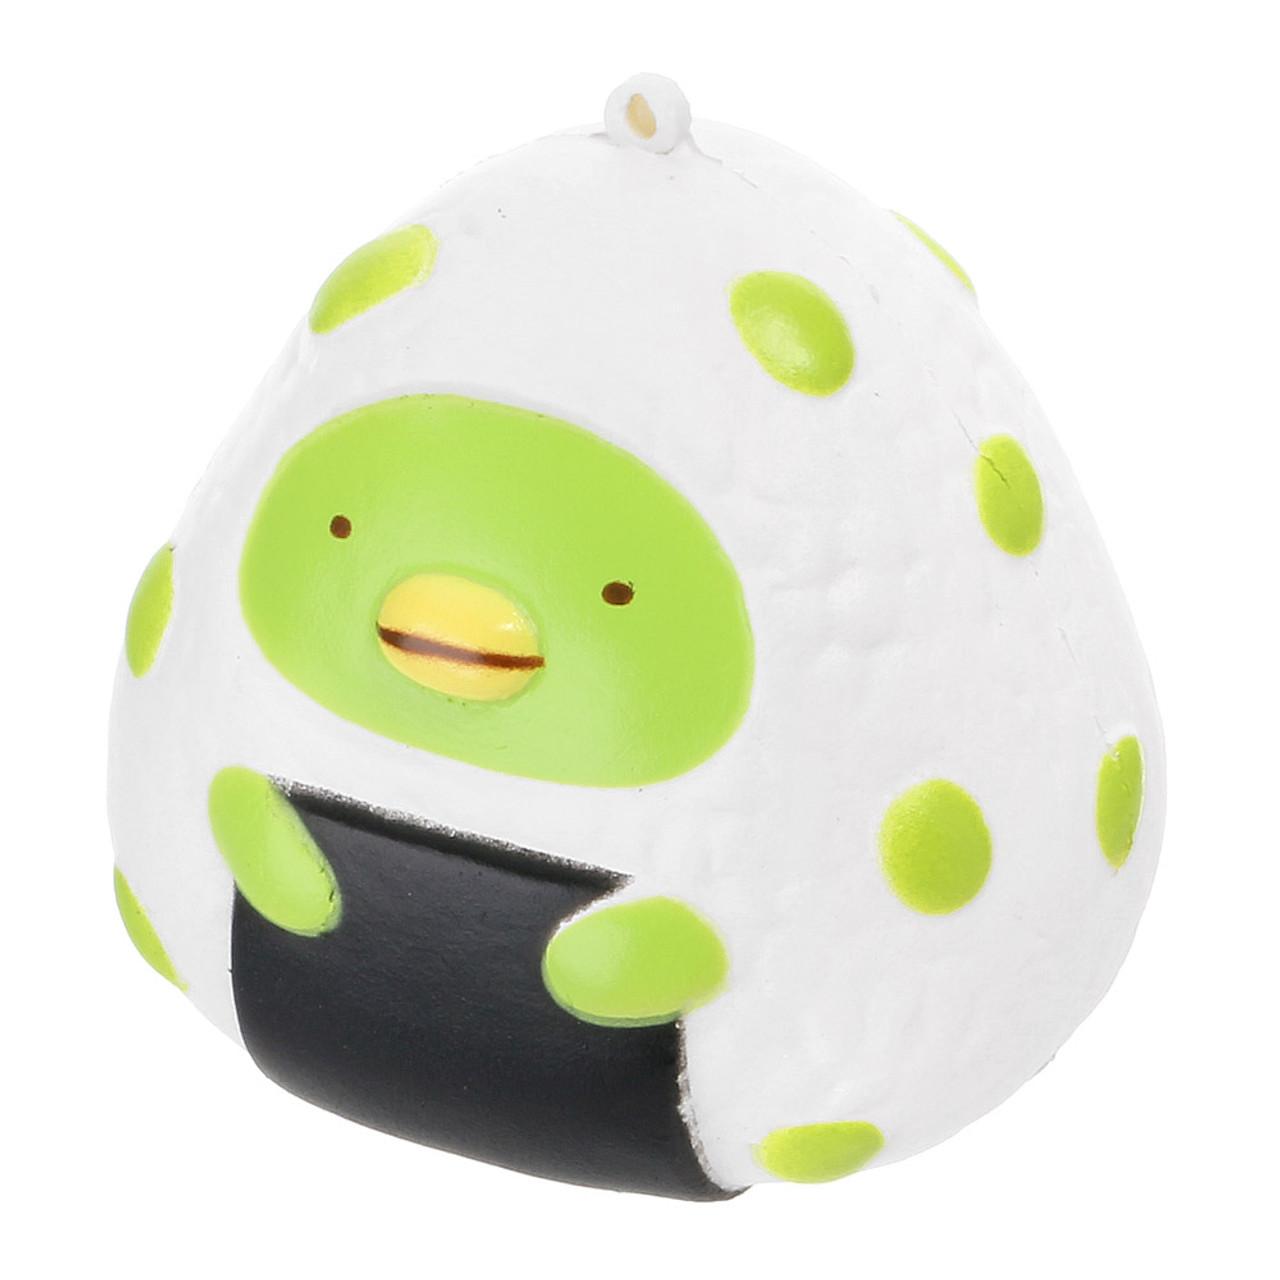 San-x Sumikko Gurashi Rice Ball Penguin Squishy Toys Charms ( Green Penguin  )